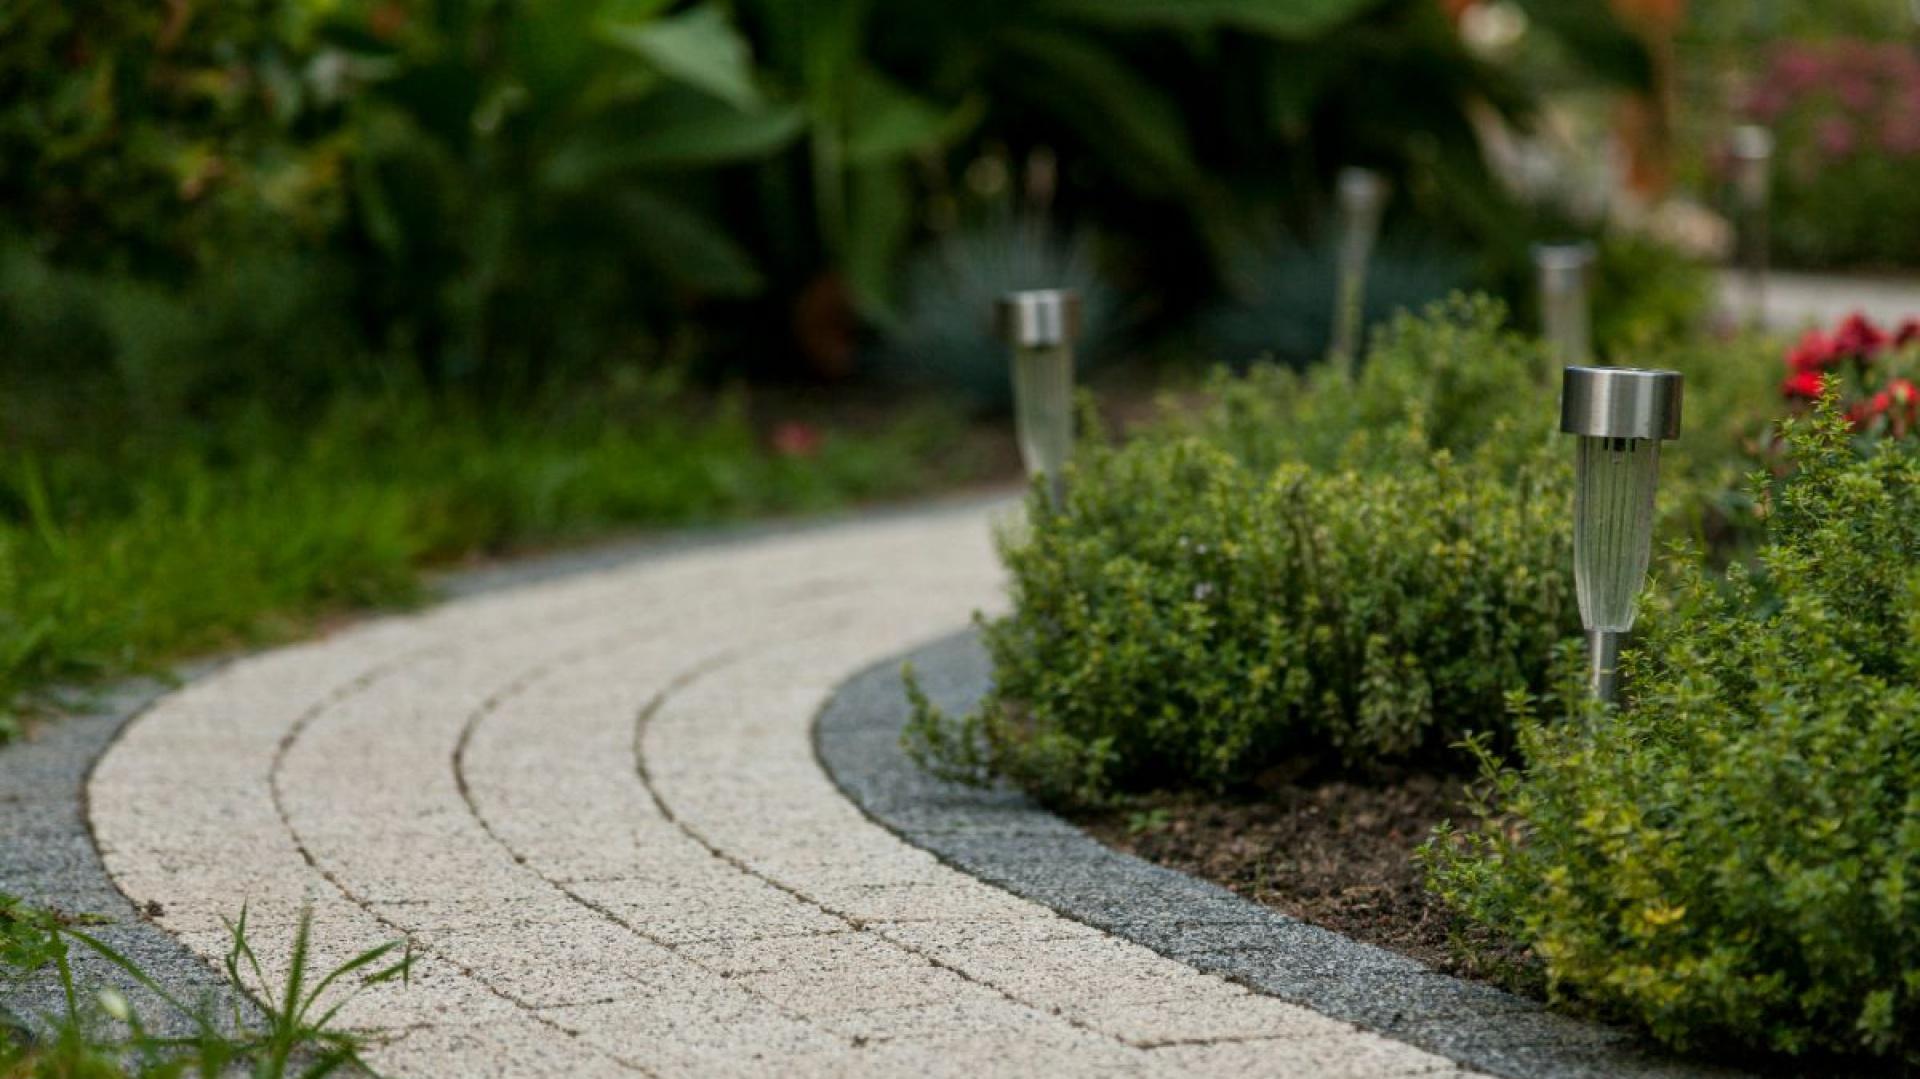 Kostka betonowa kreta płukana. Fot. Buszrem